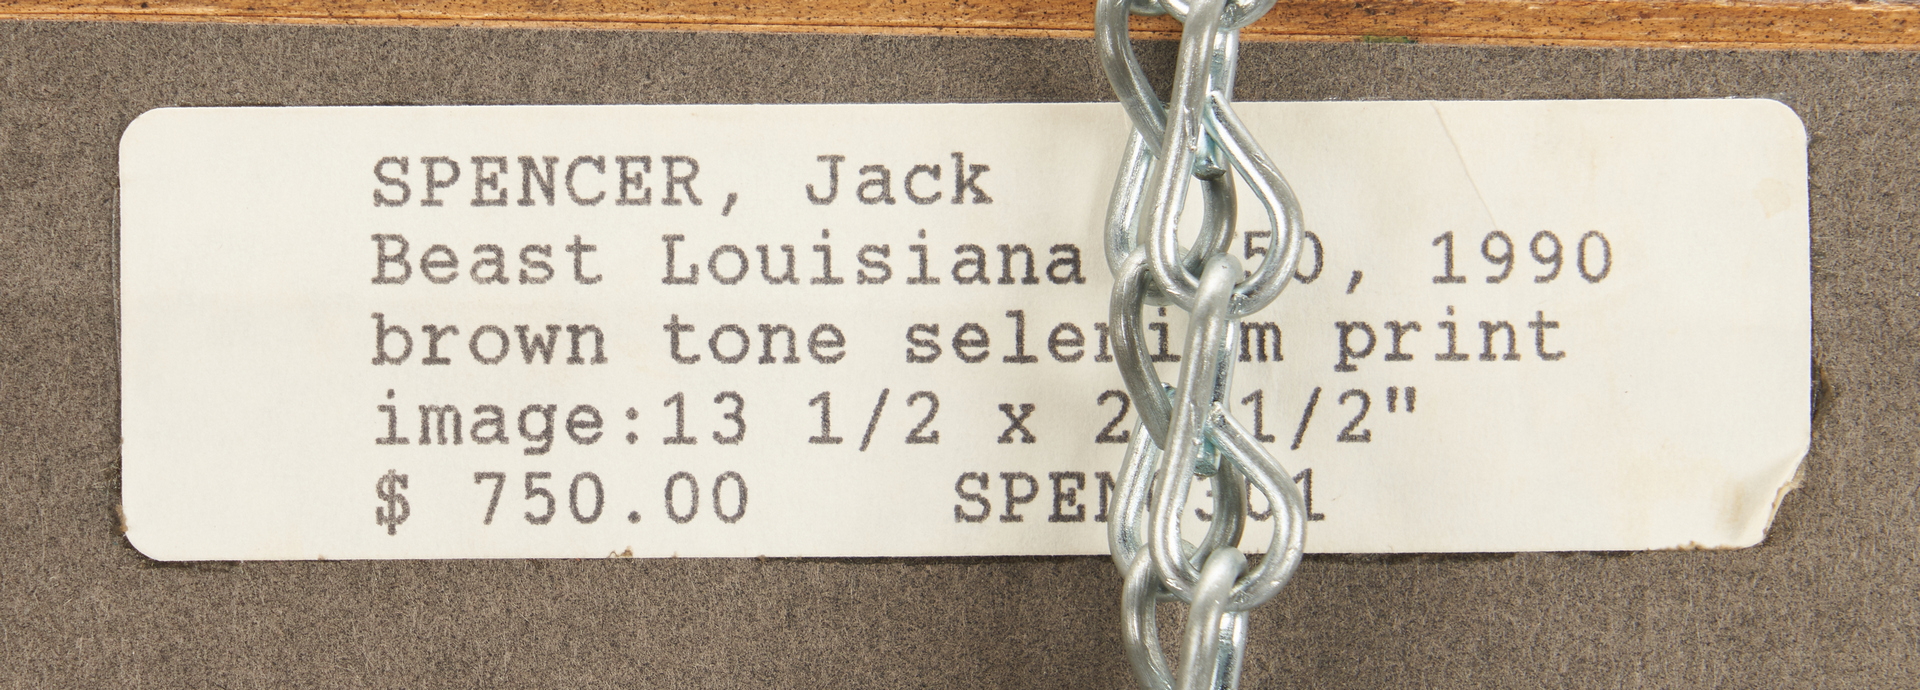 Lot 521: Jack Spencer Photograph, Beast Louisiana